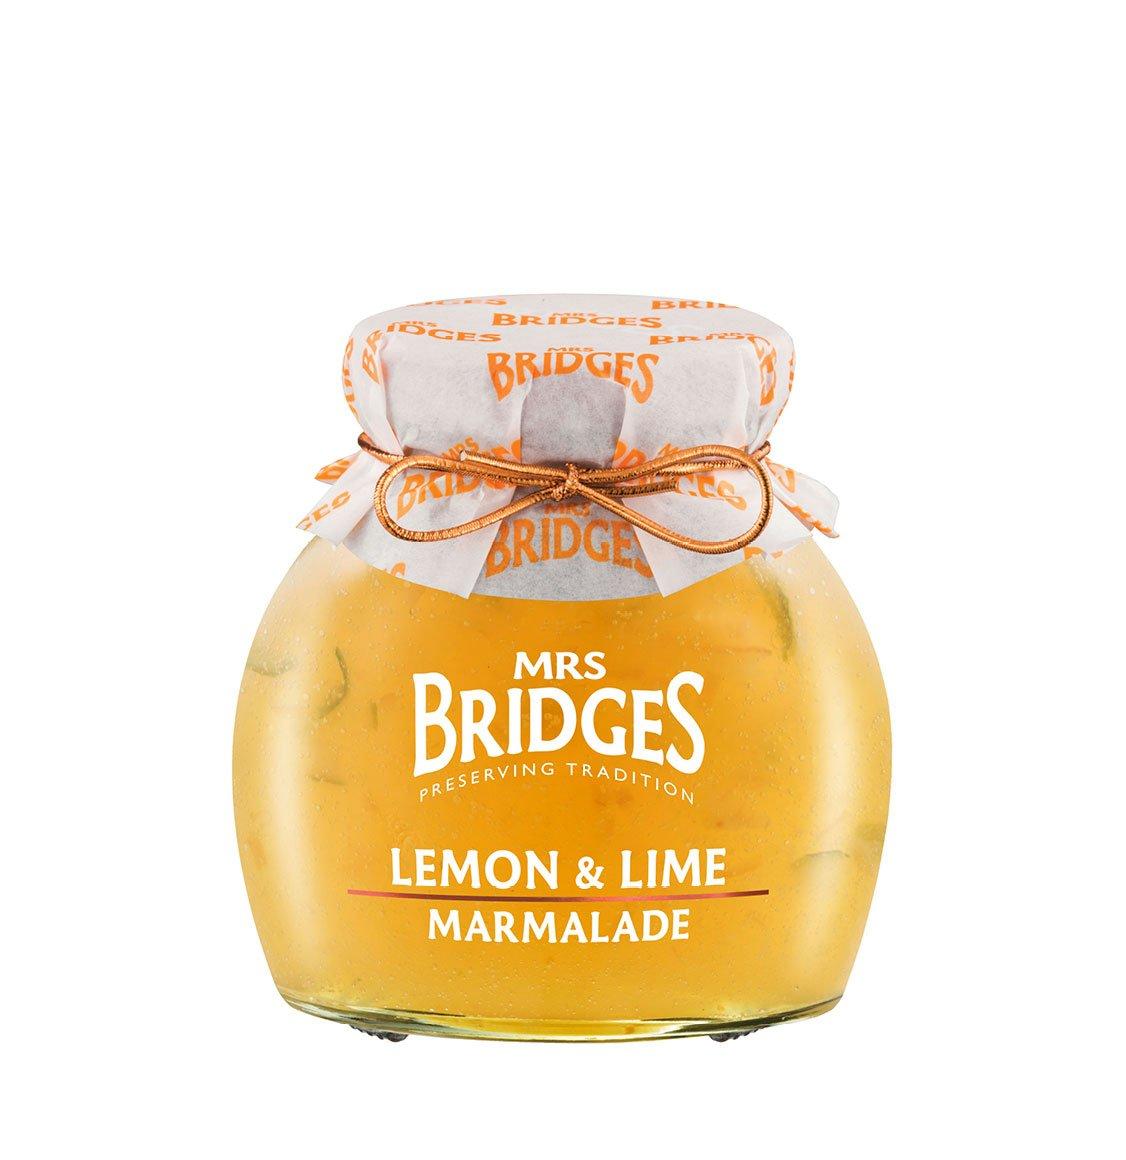 Mrs Bridges Μαρμελάδα Λεμόνι Και Lime 340g